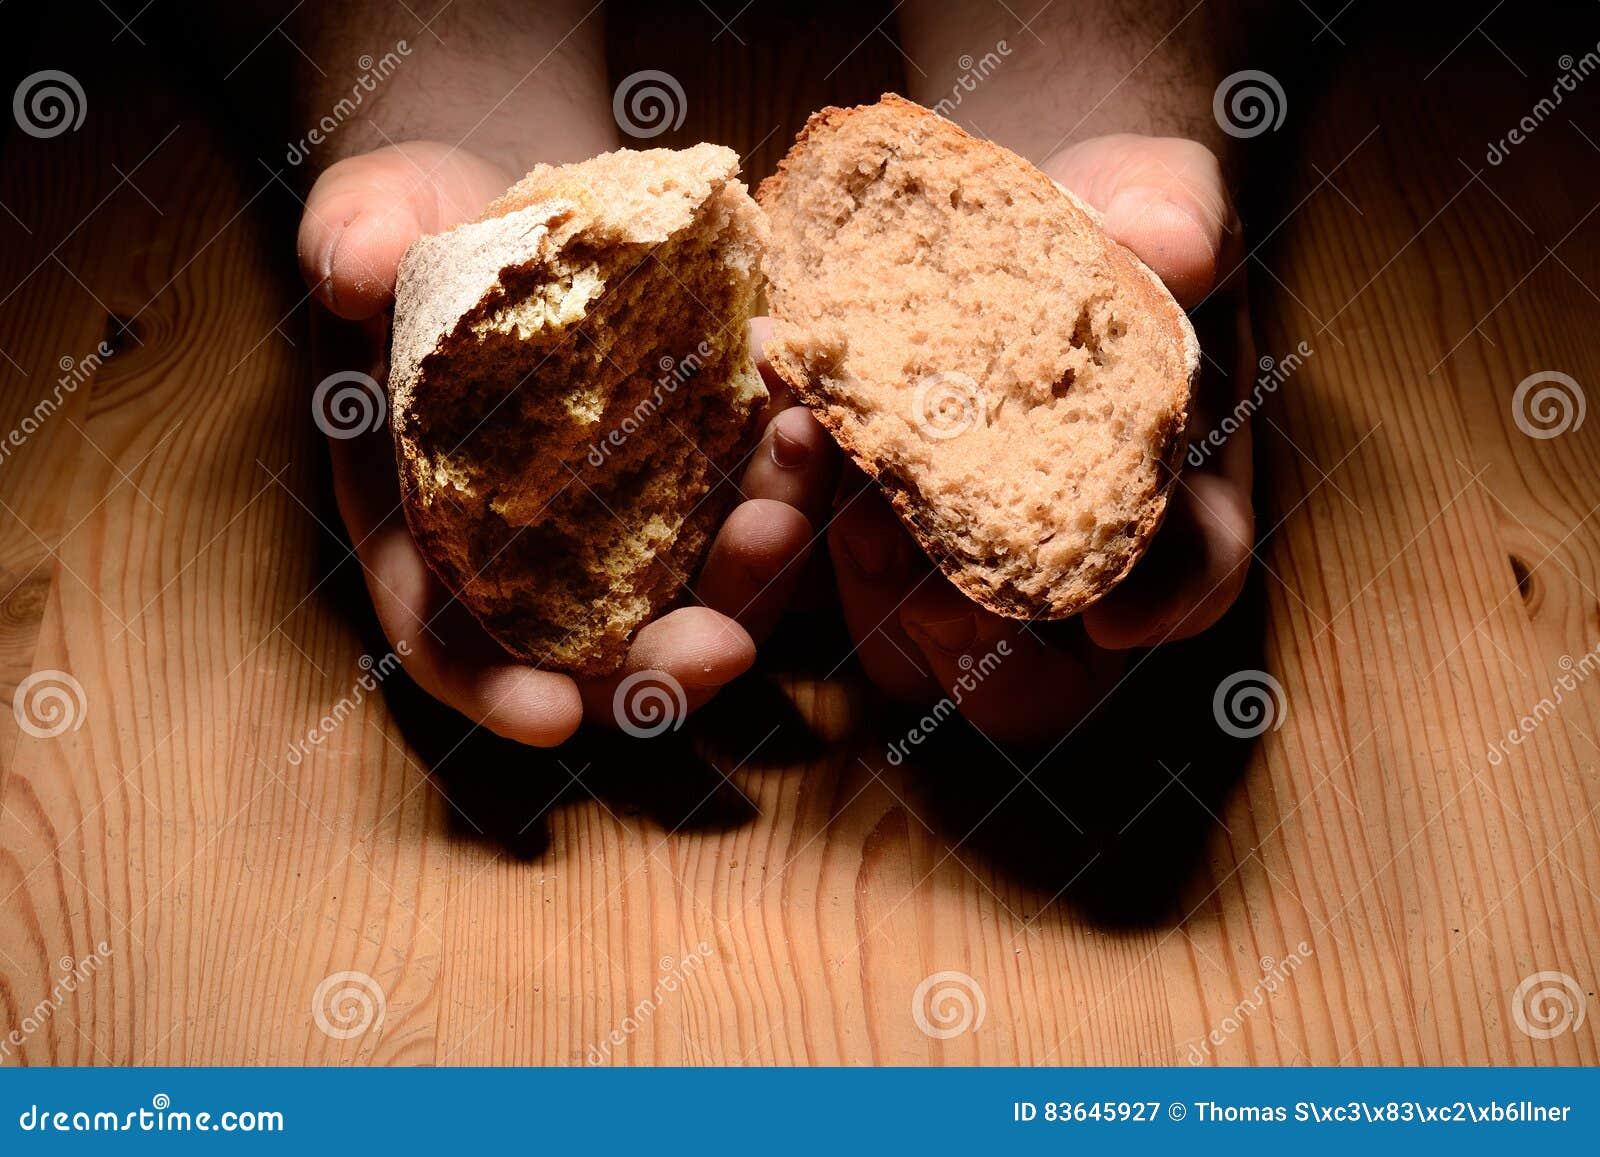 Rottura del pane